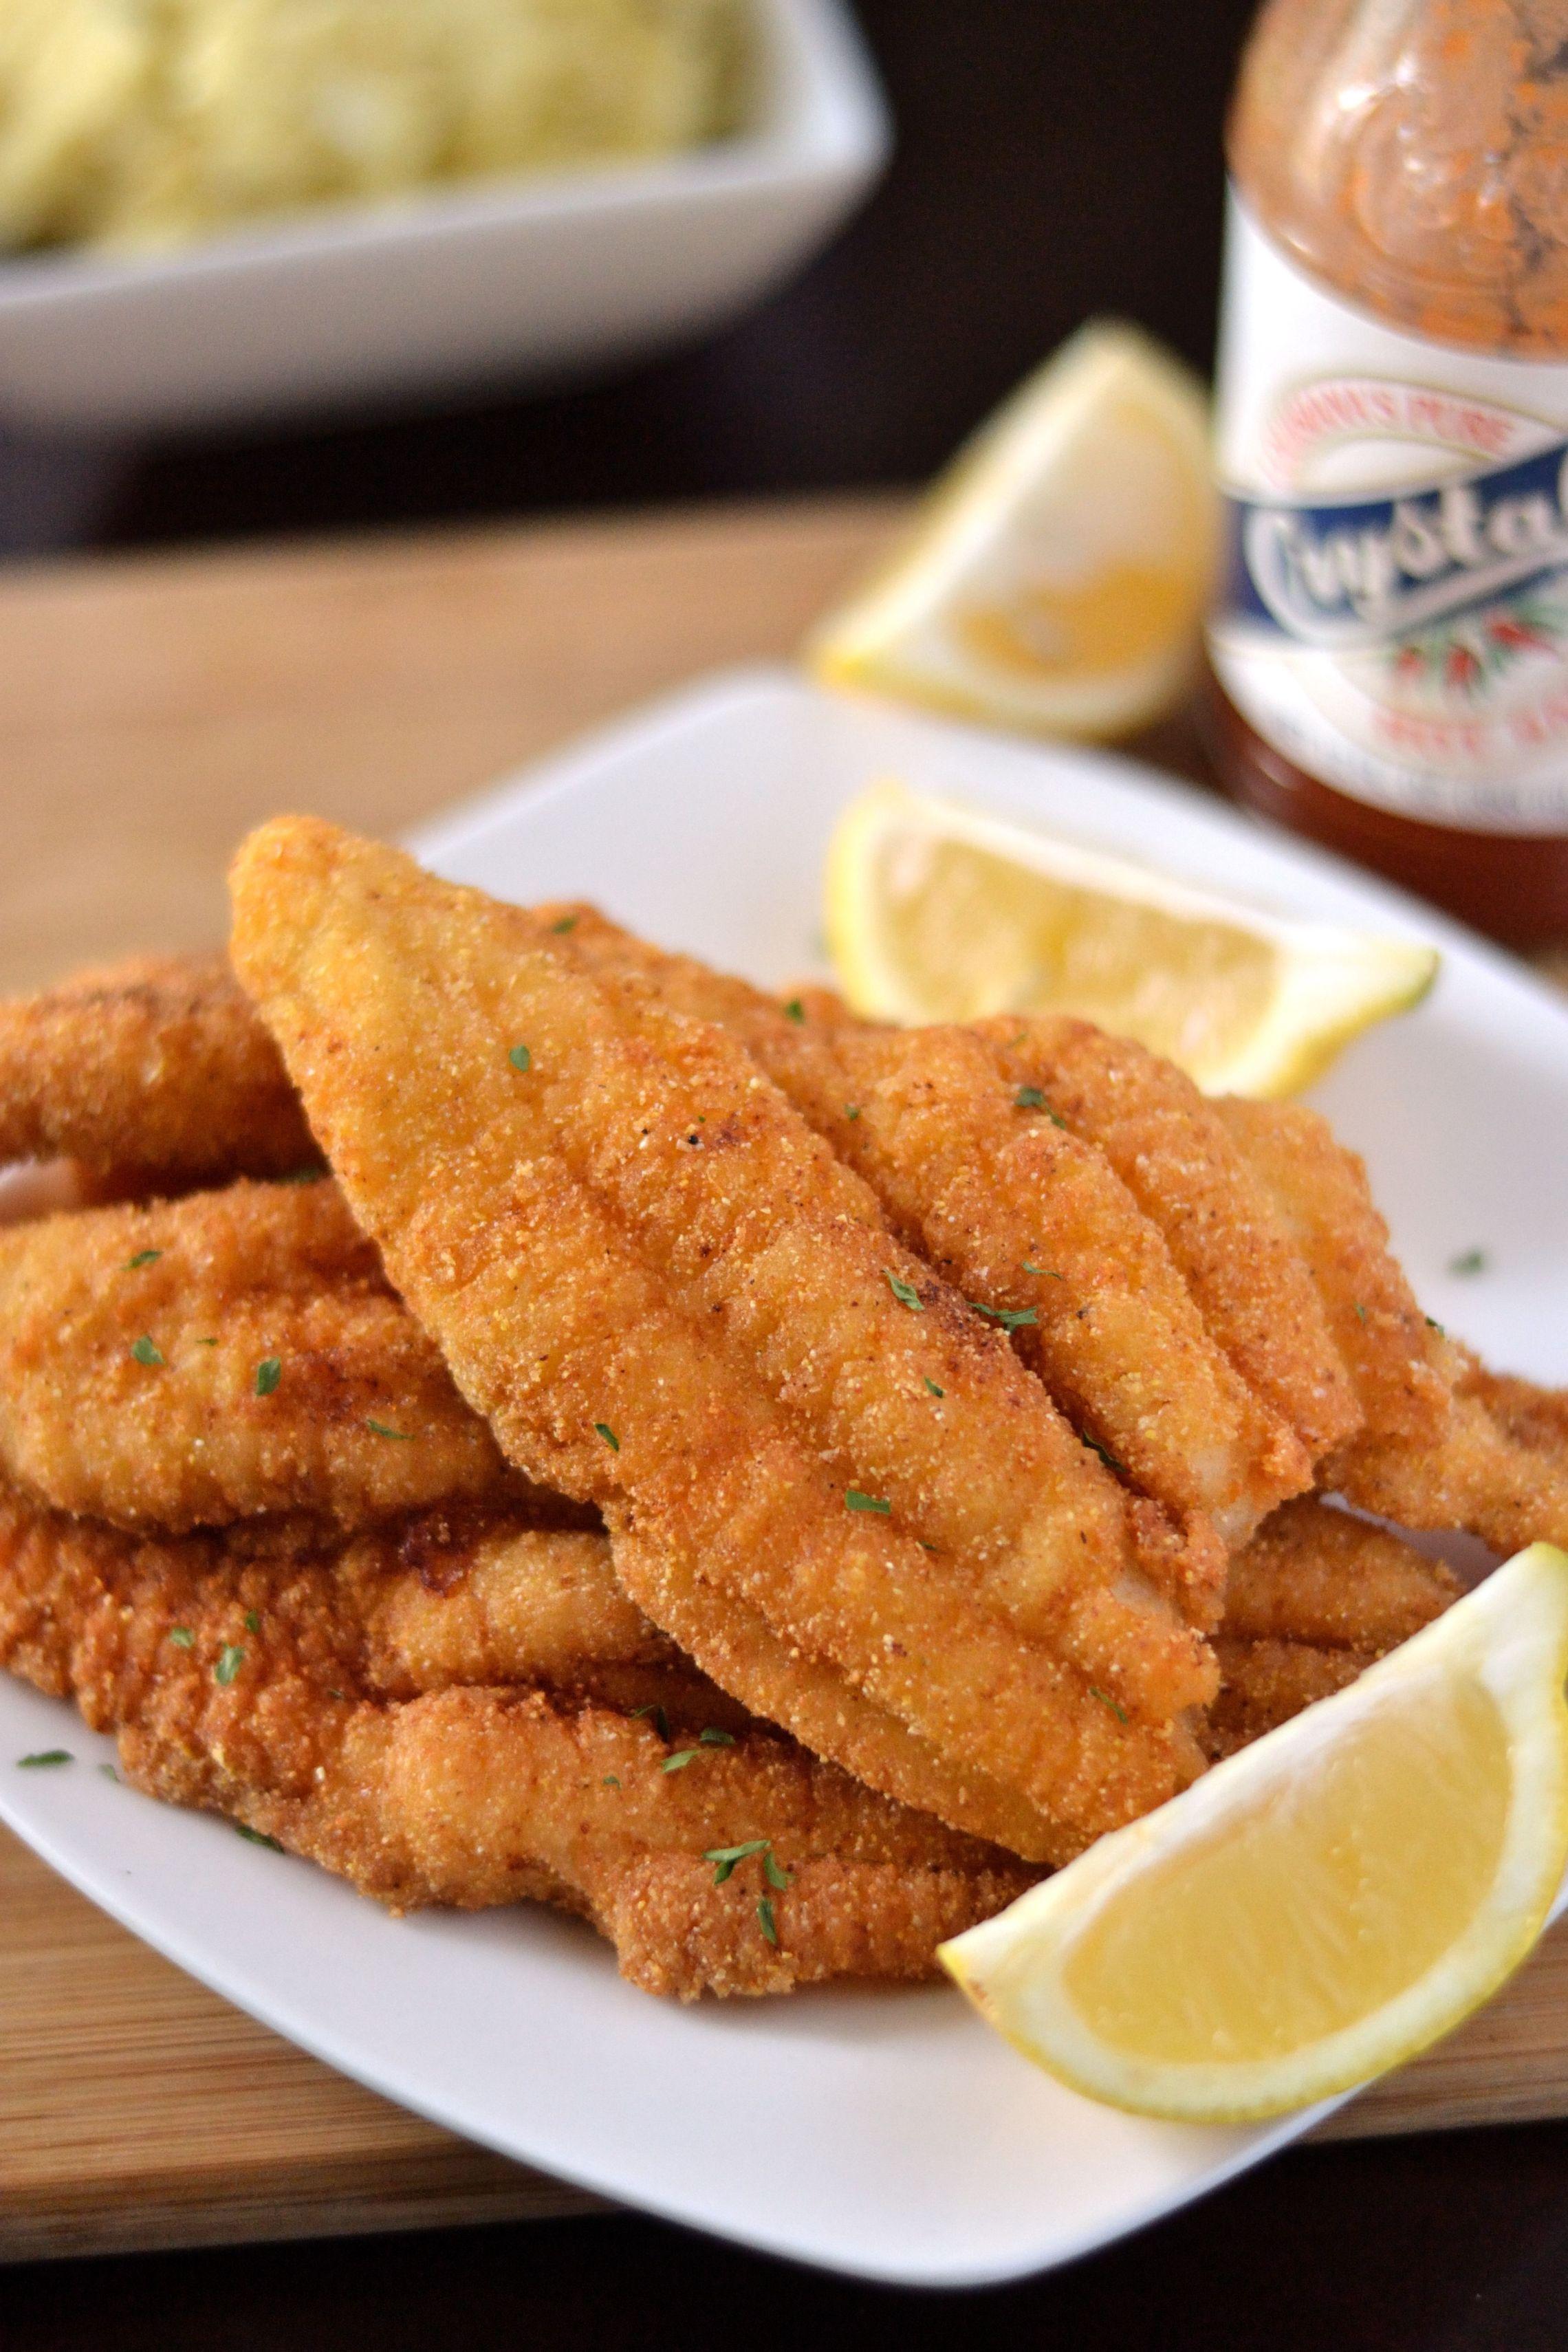 Southern Fried Catfish Recipe Catfish recipes, Fried